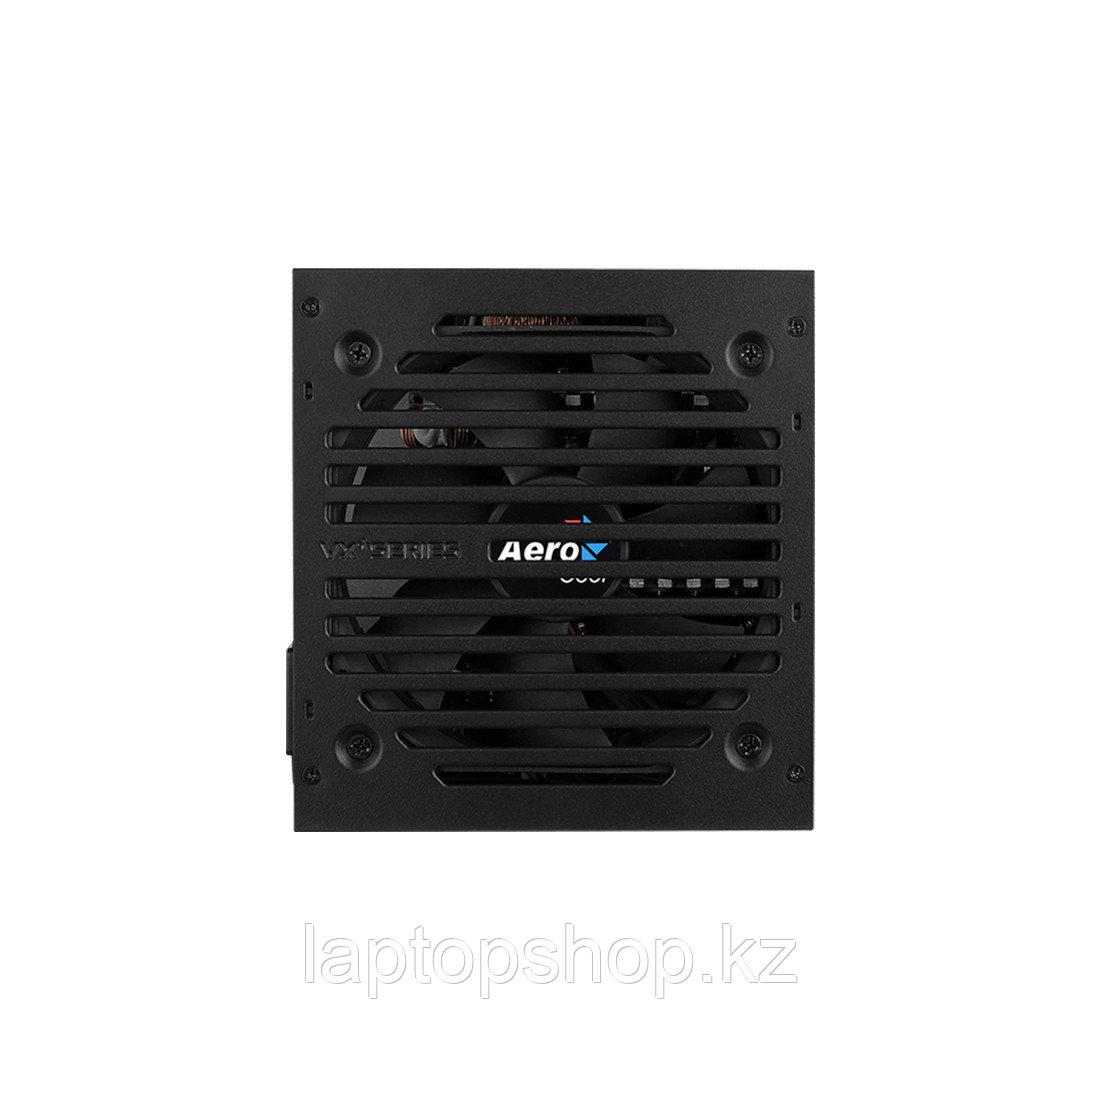 Блок питания Aerocool VX PLUS 400, 400W, ATX